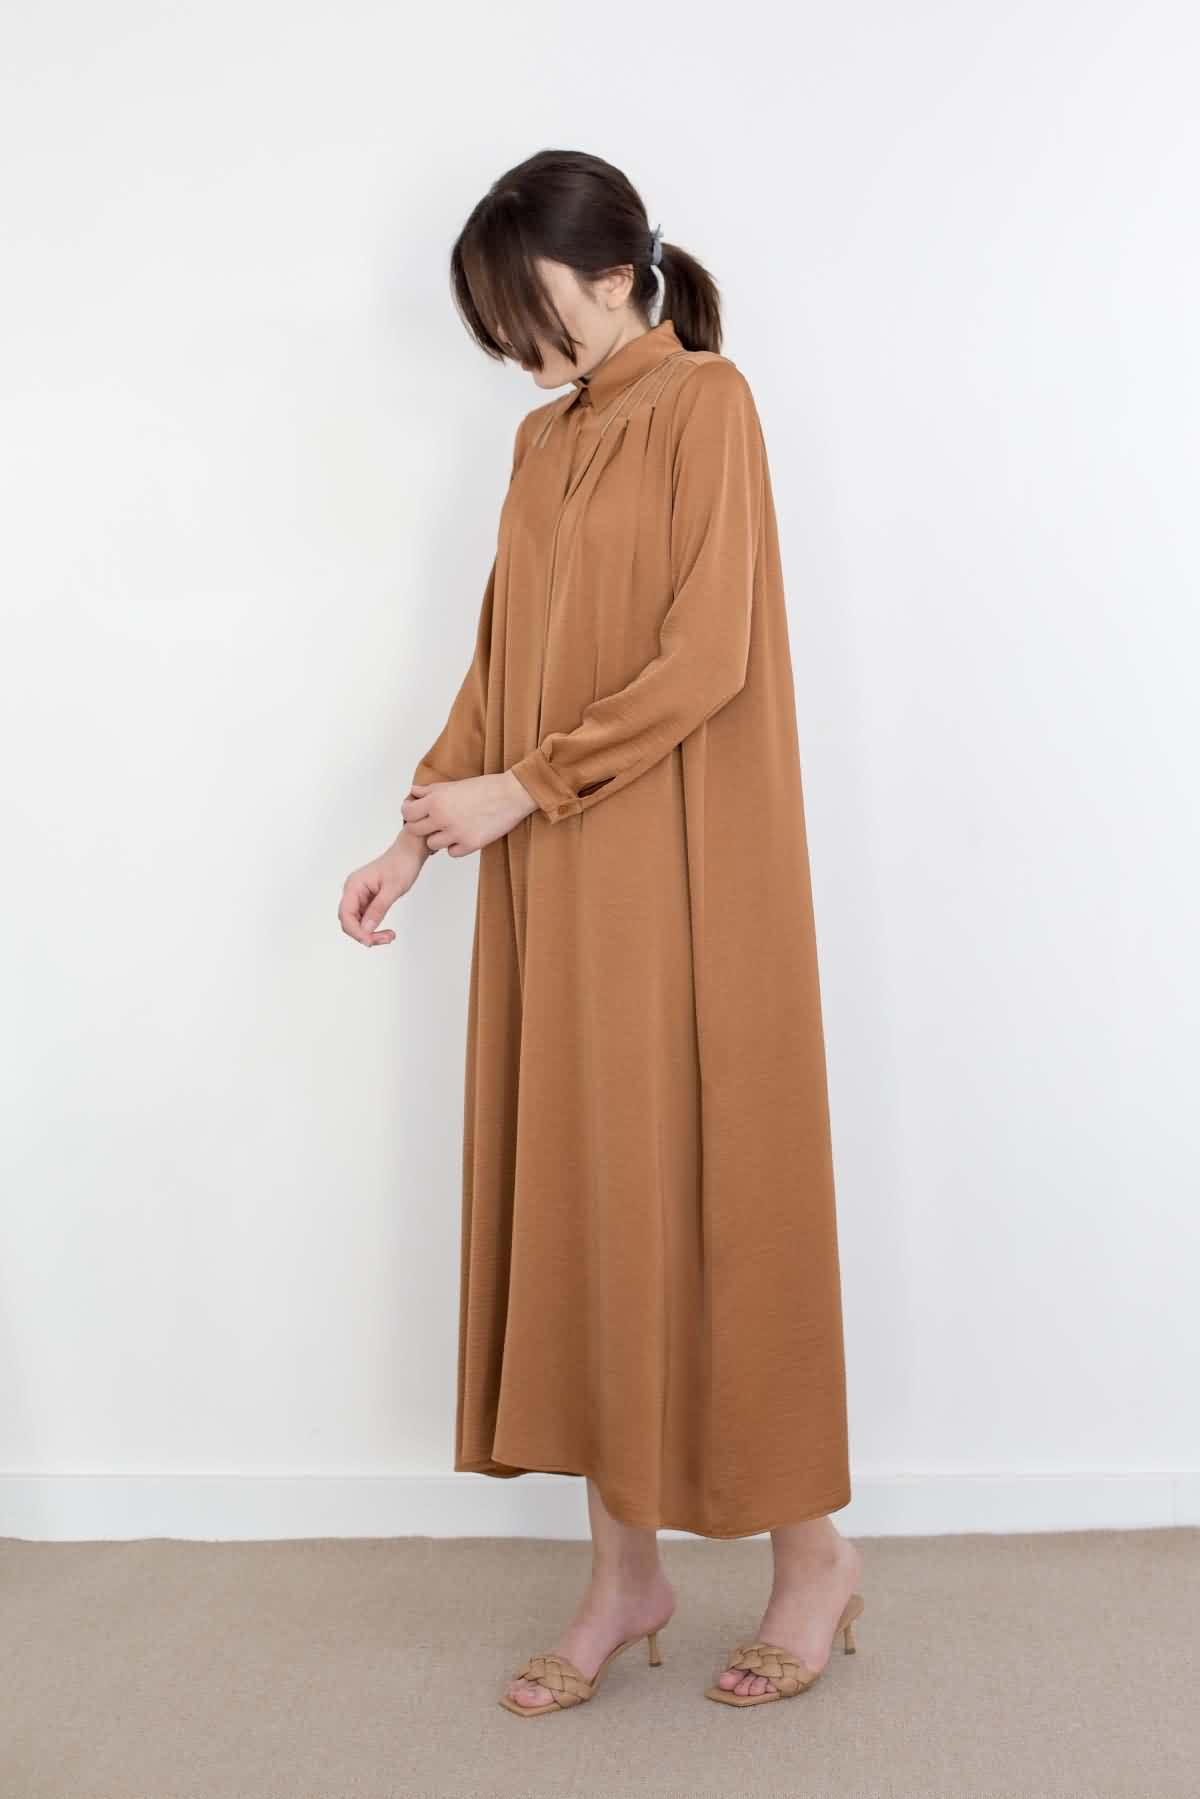 Mevra - Omzu Pileli Elbise Toffee